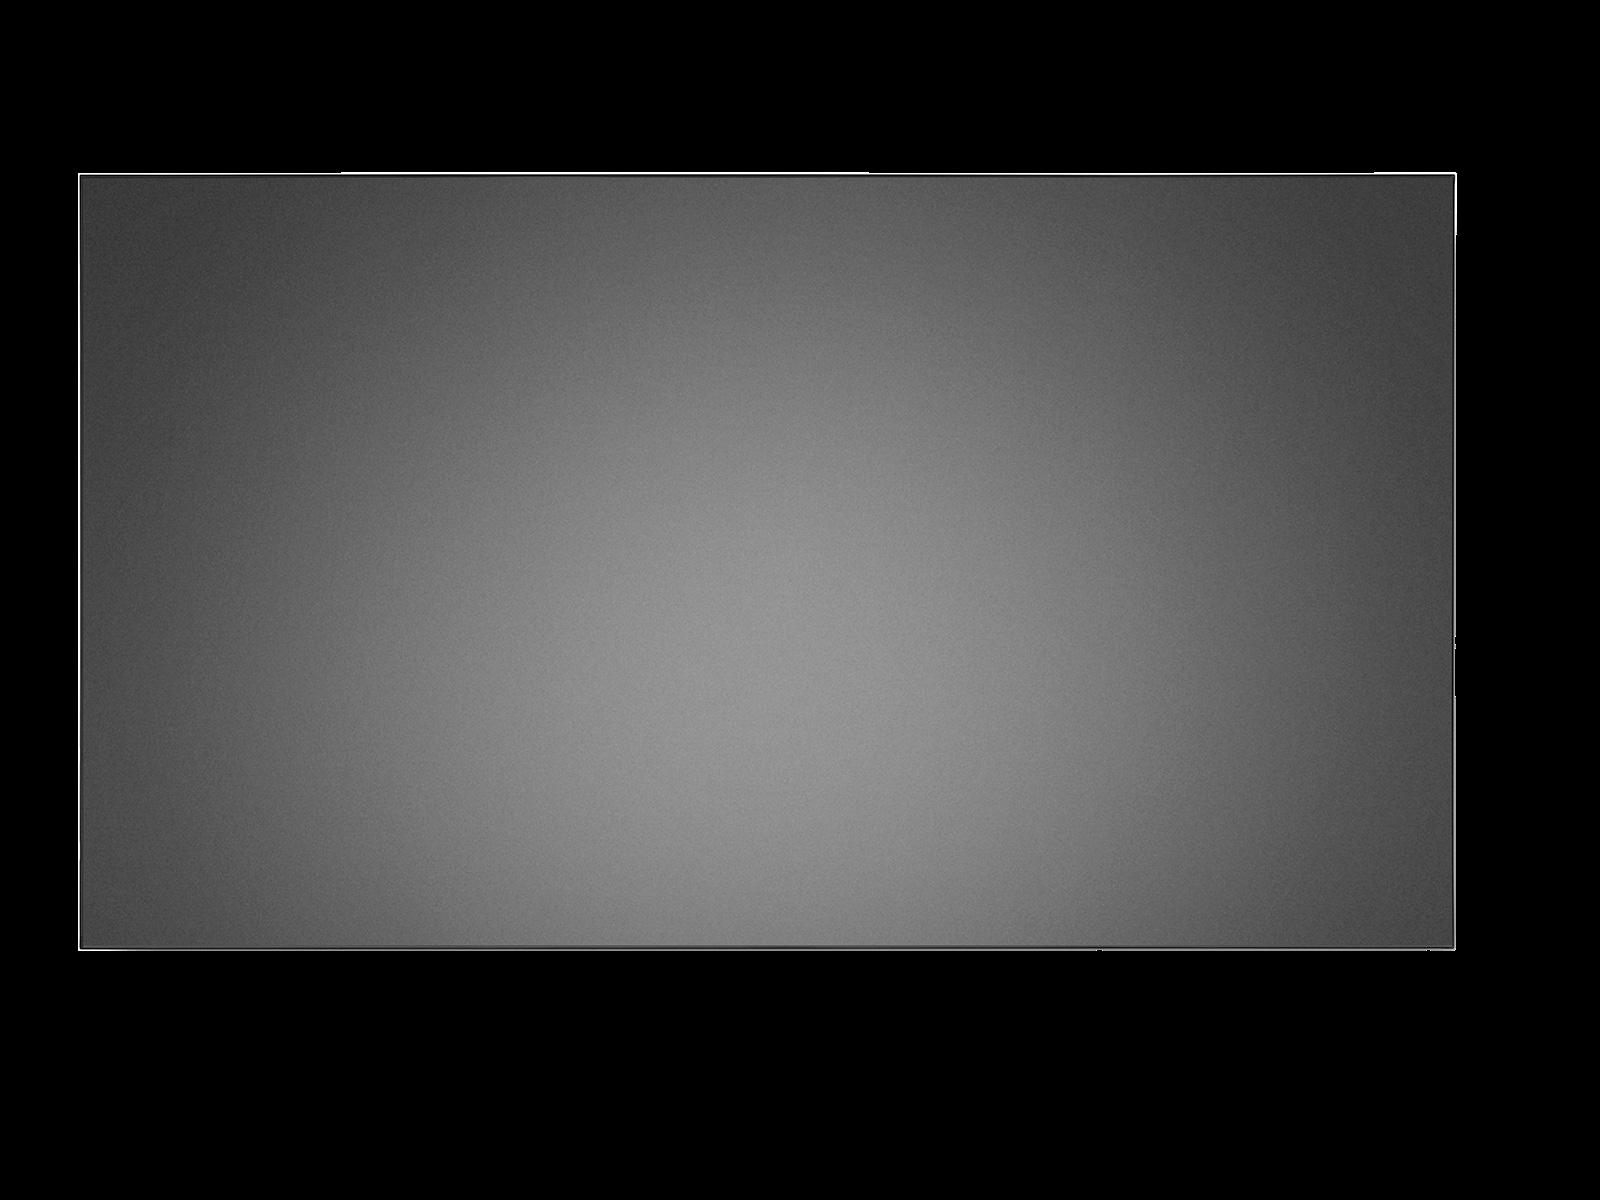 NEC_UN462A_HO_blank_1600x1200-5